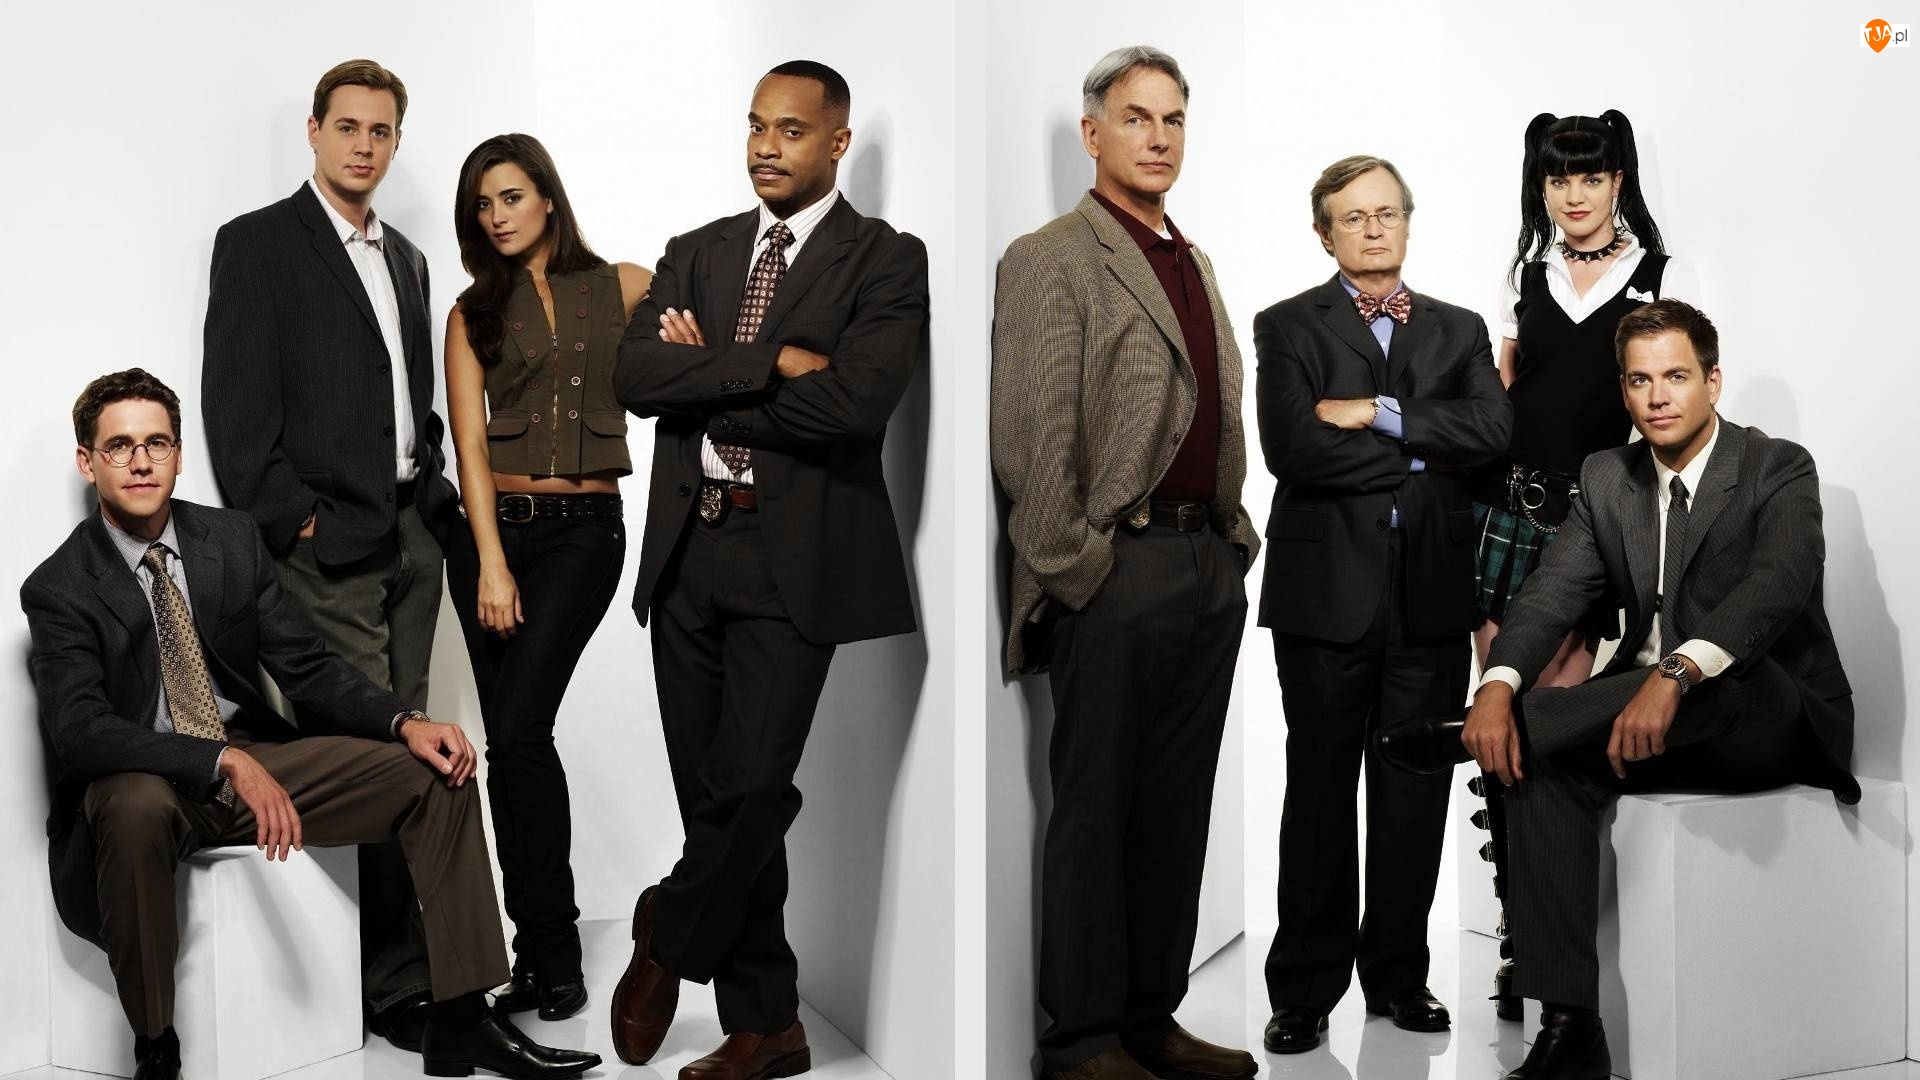 Aktorzy, Ncis, Serial, Agenci